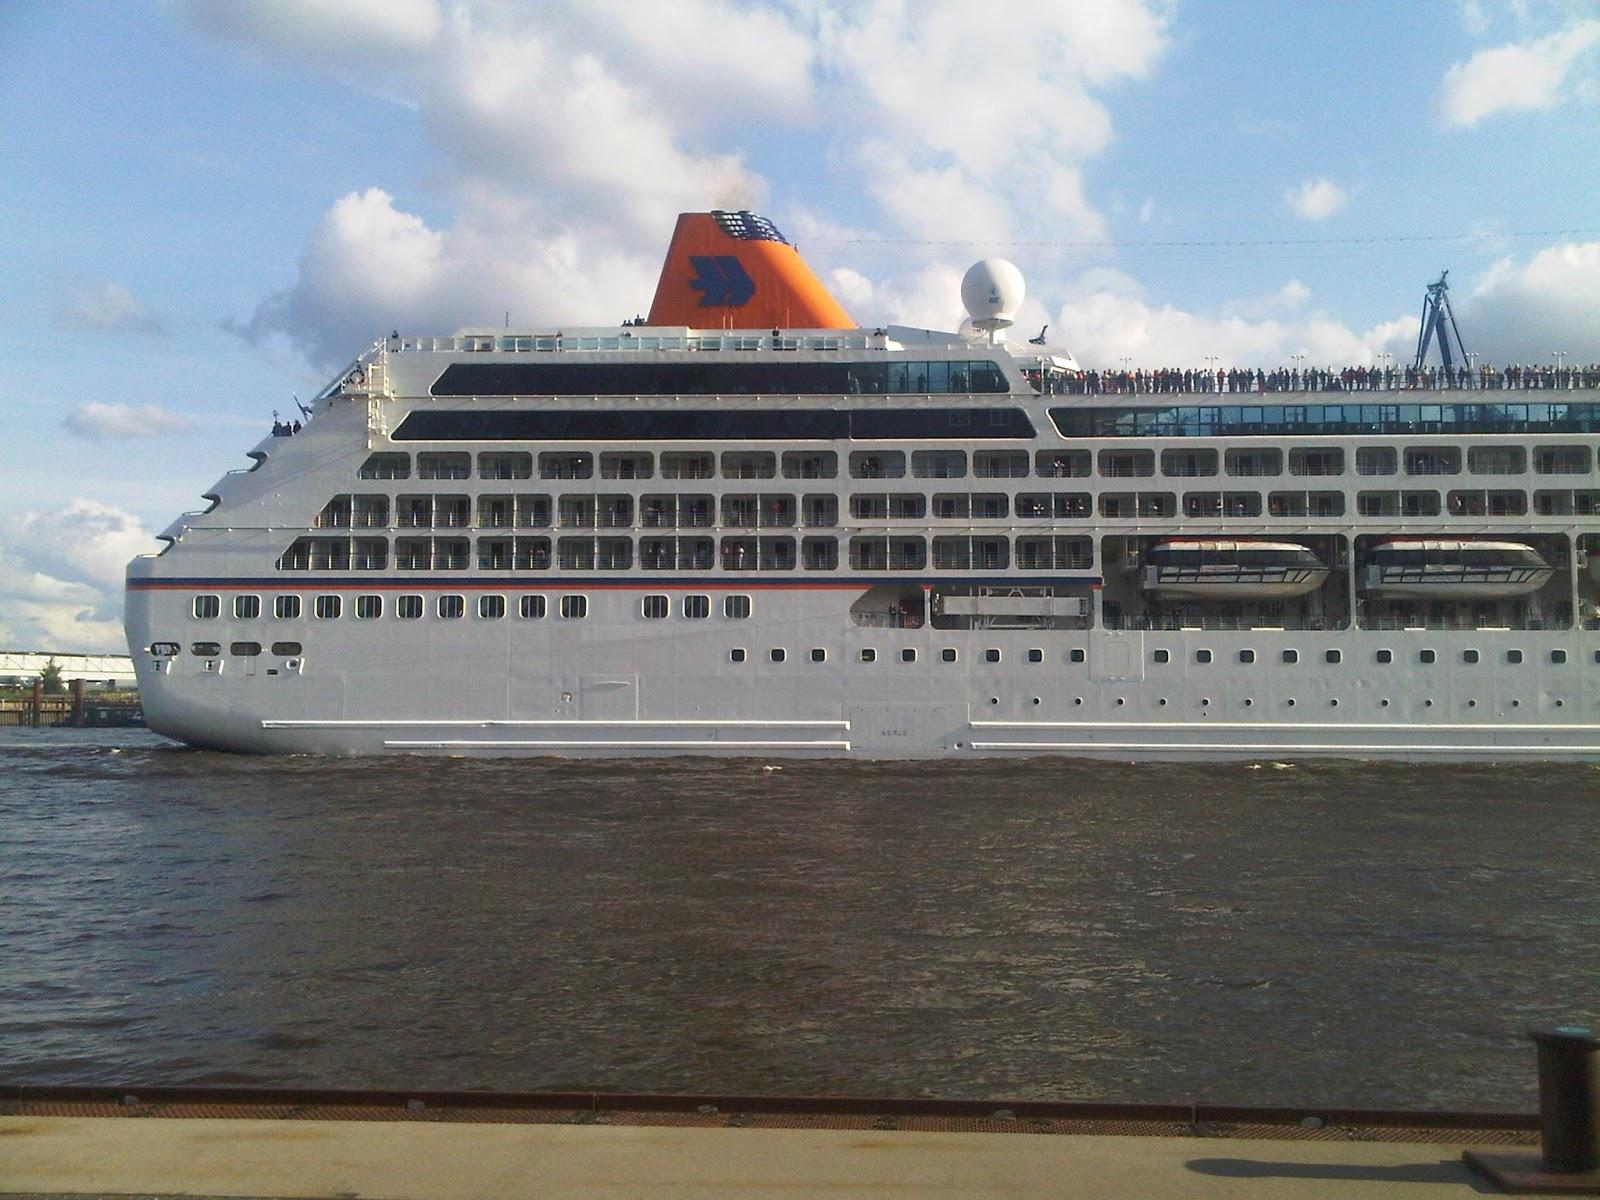 Columbus 2 verlässt den Hamburger Hafen. Das Heck. Winkende Menschen an Oberdeck.